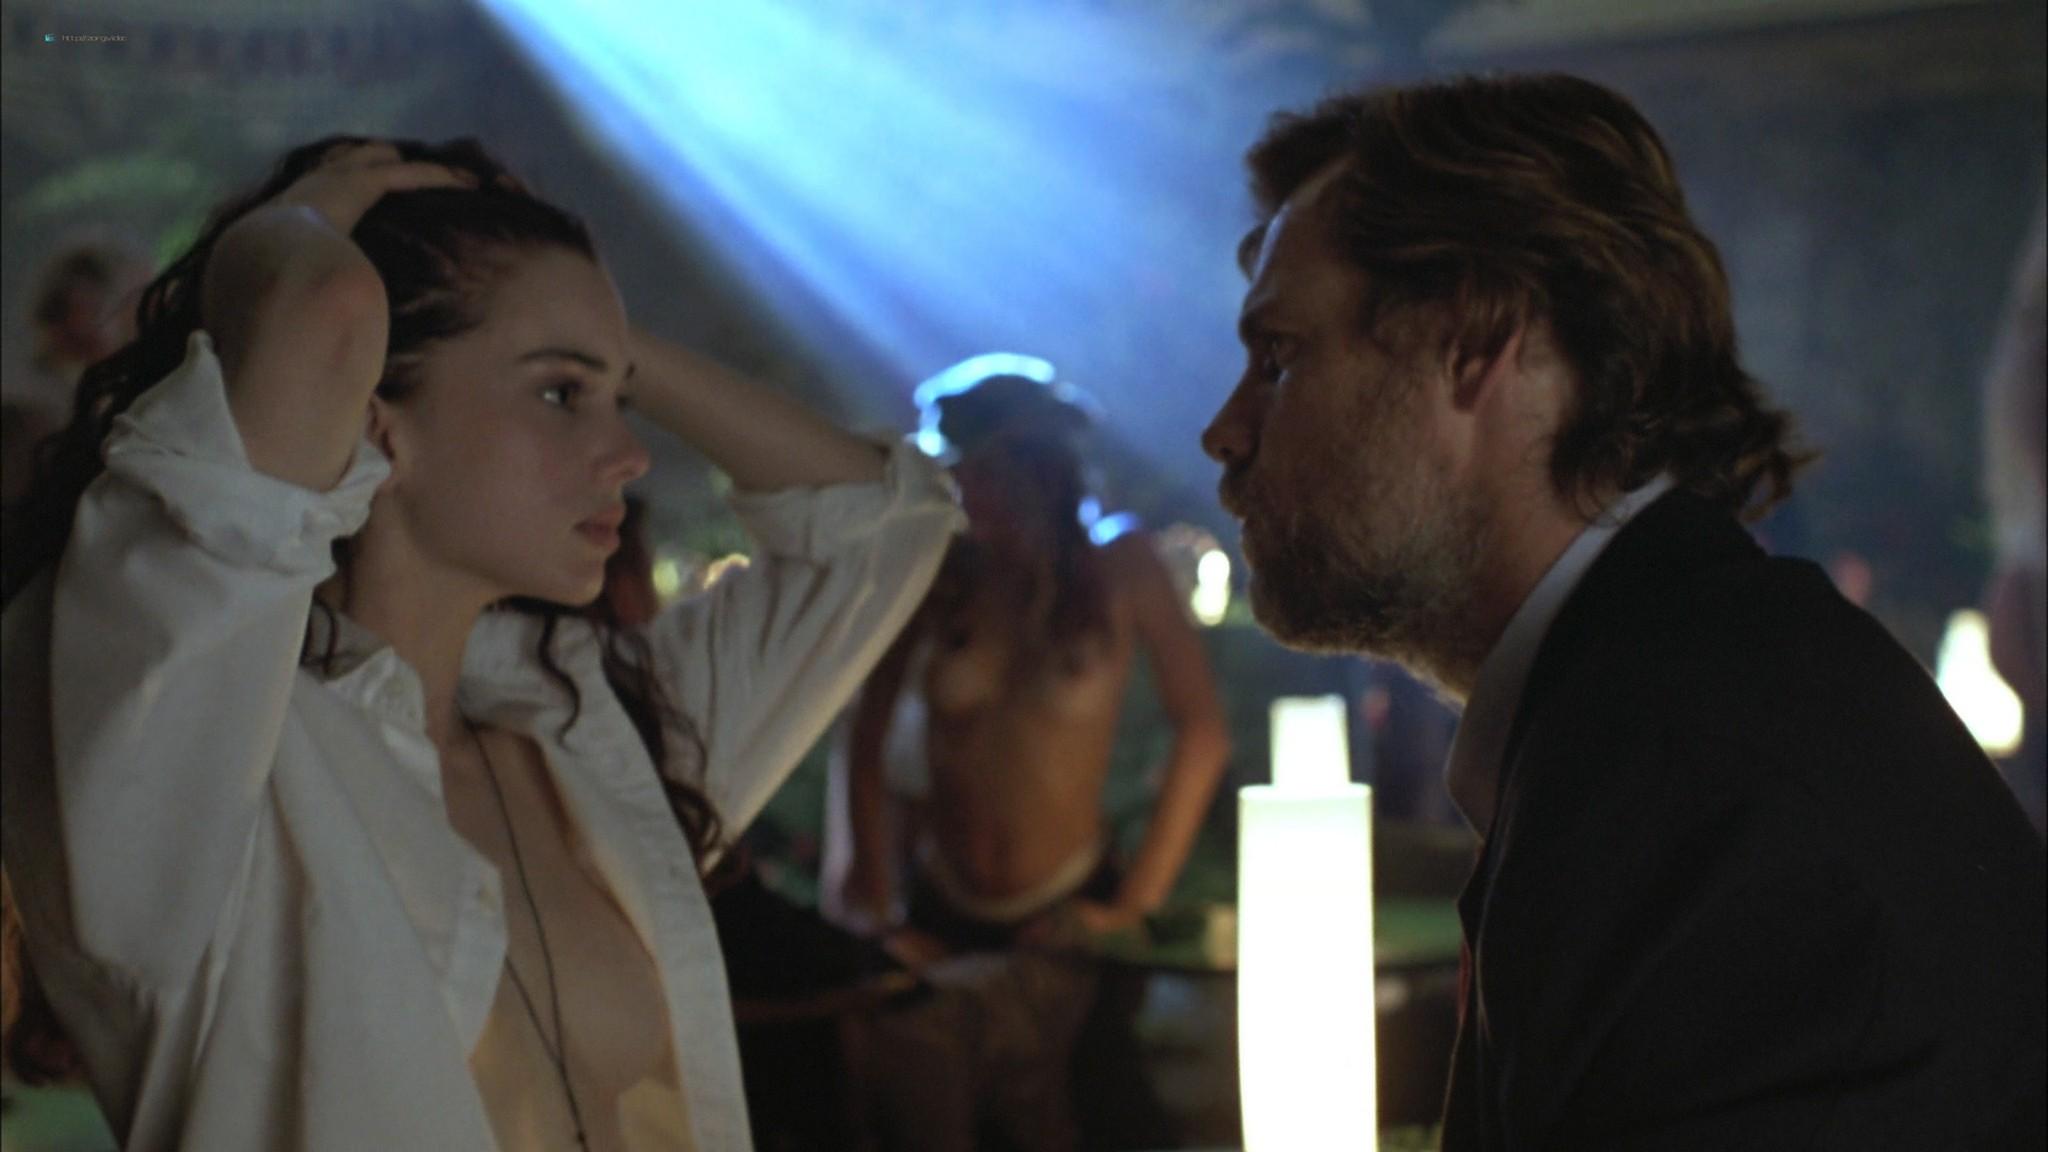 Mia Kirshner nude Arsinée Khanjian sexy - Exotica (1994) HD 1080p BluRay REMUX (14)